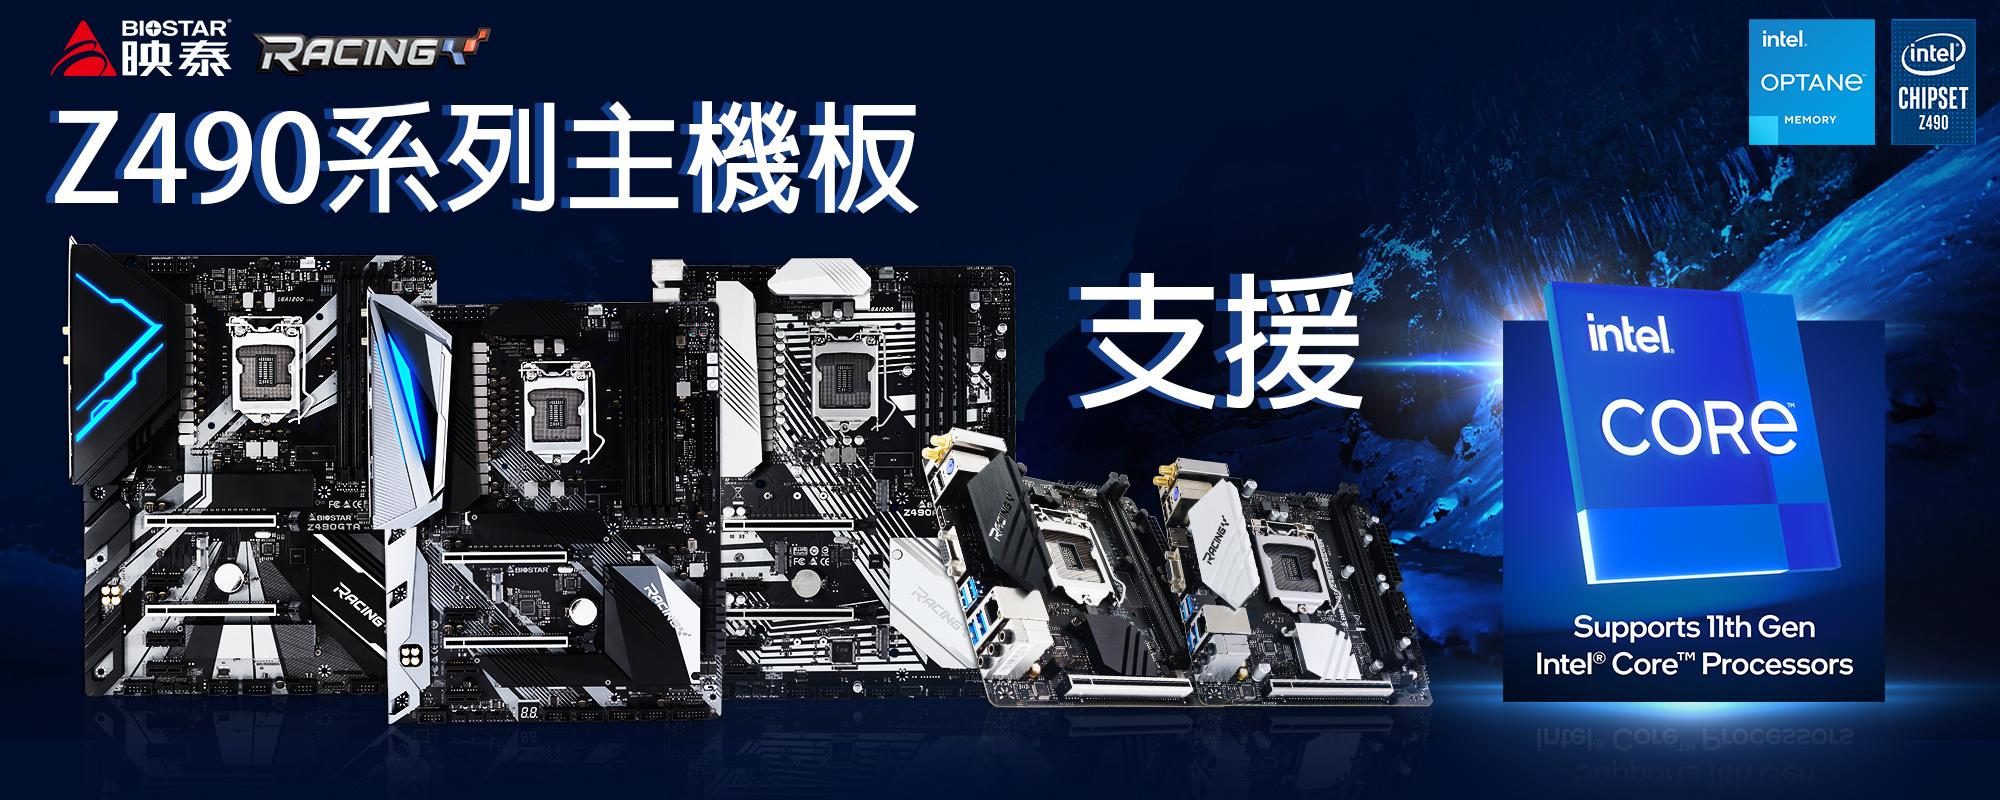 BIOSTAR_Intel 400